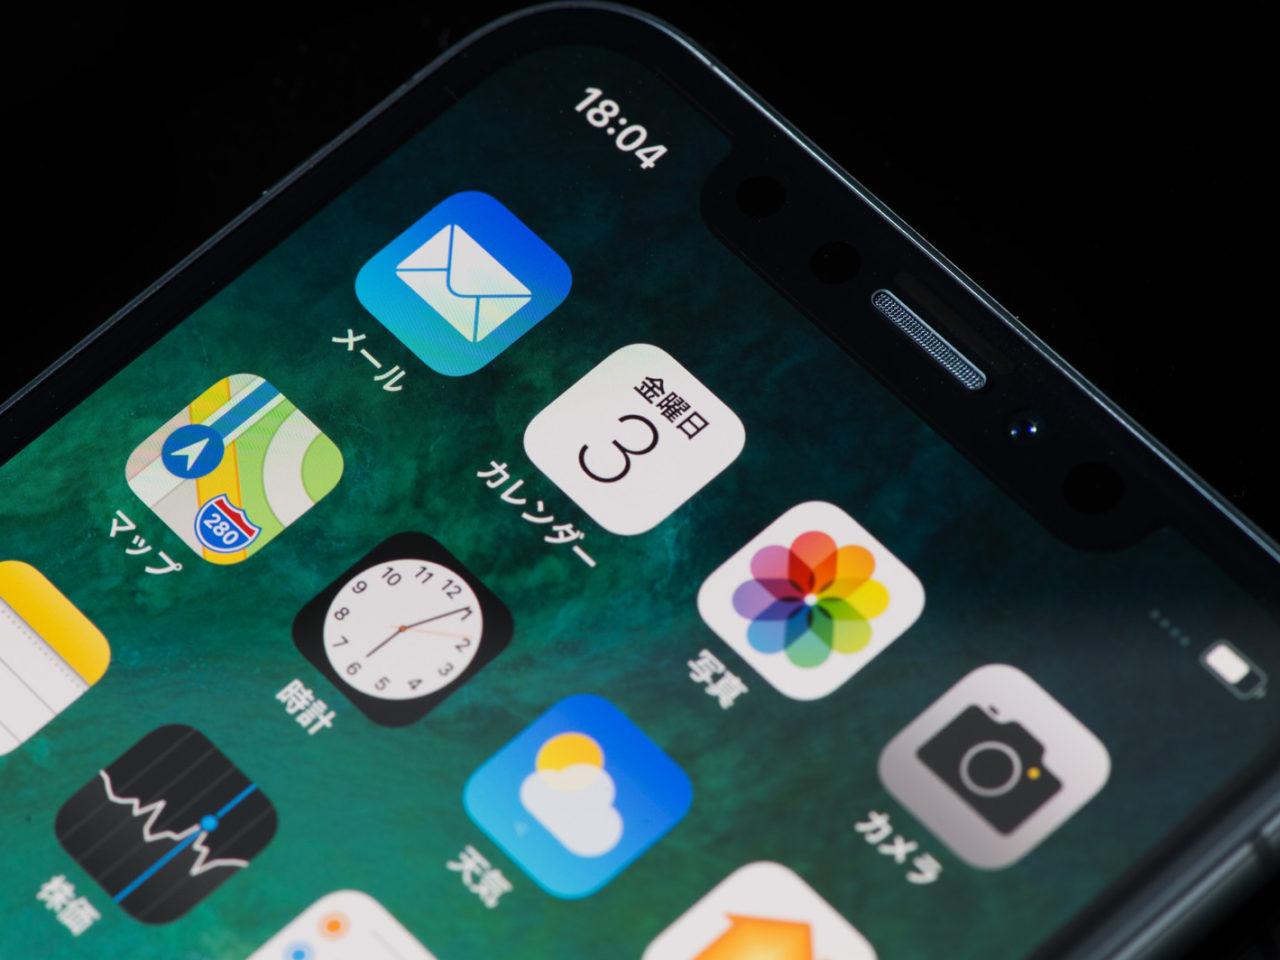 iPhoneのホーム画面を隠す&非表示にする方法!iOS14で解説!のサムネイル画像